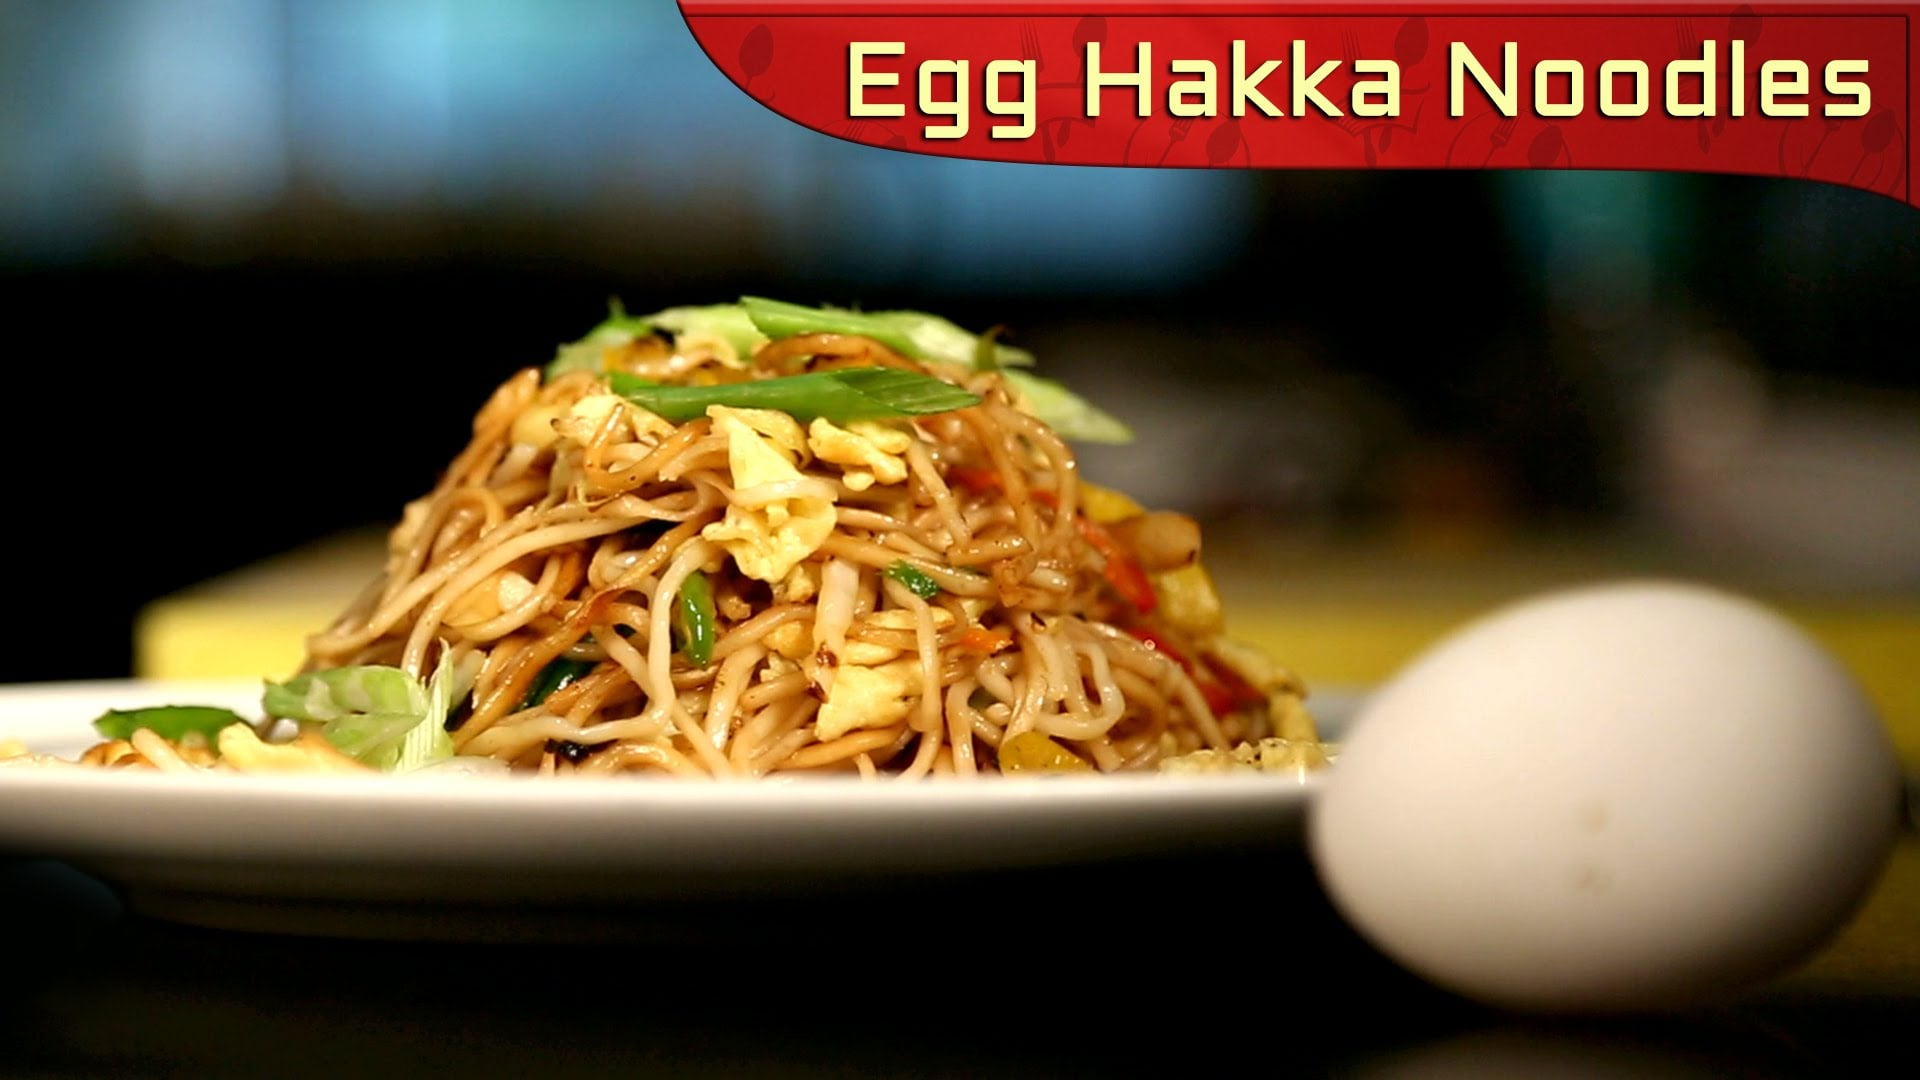 Egg Hakka Noodle | Chinese Hakka Noddles | Hakka Noodles Recipe